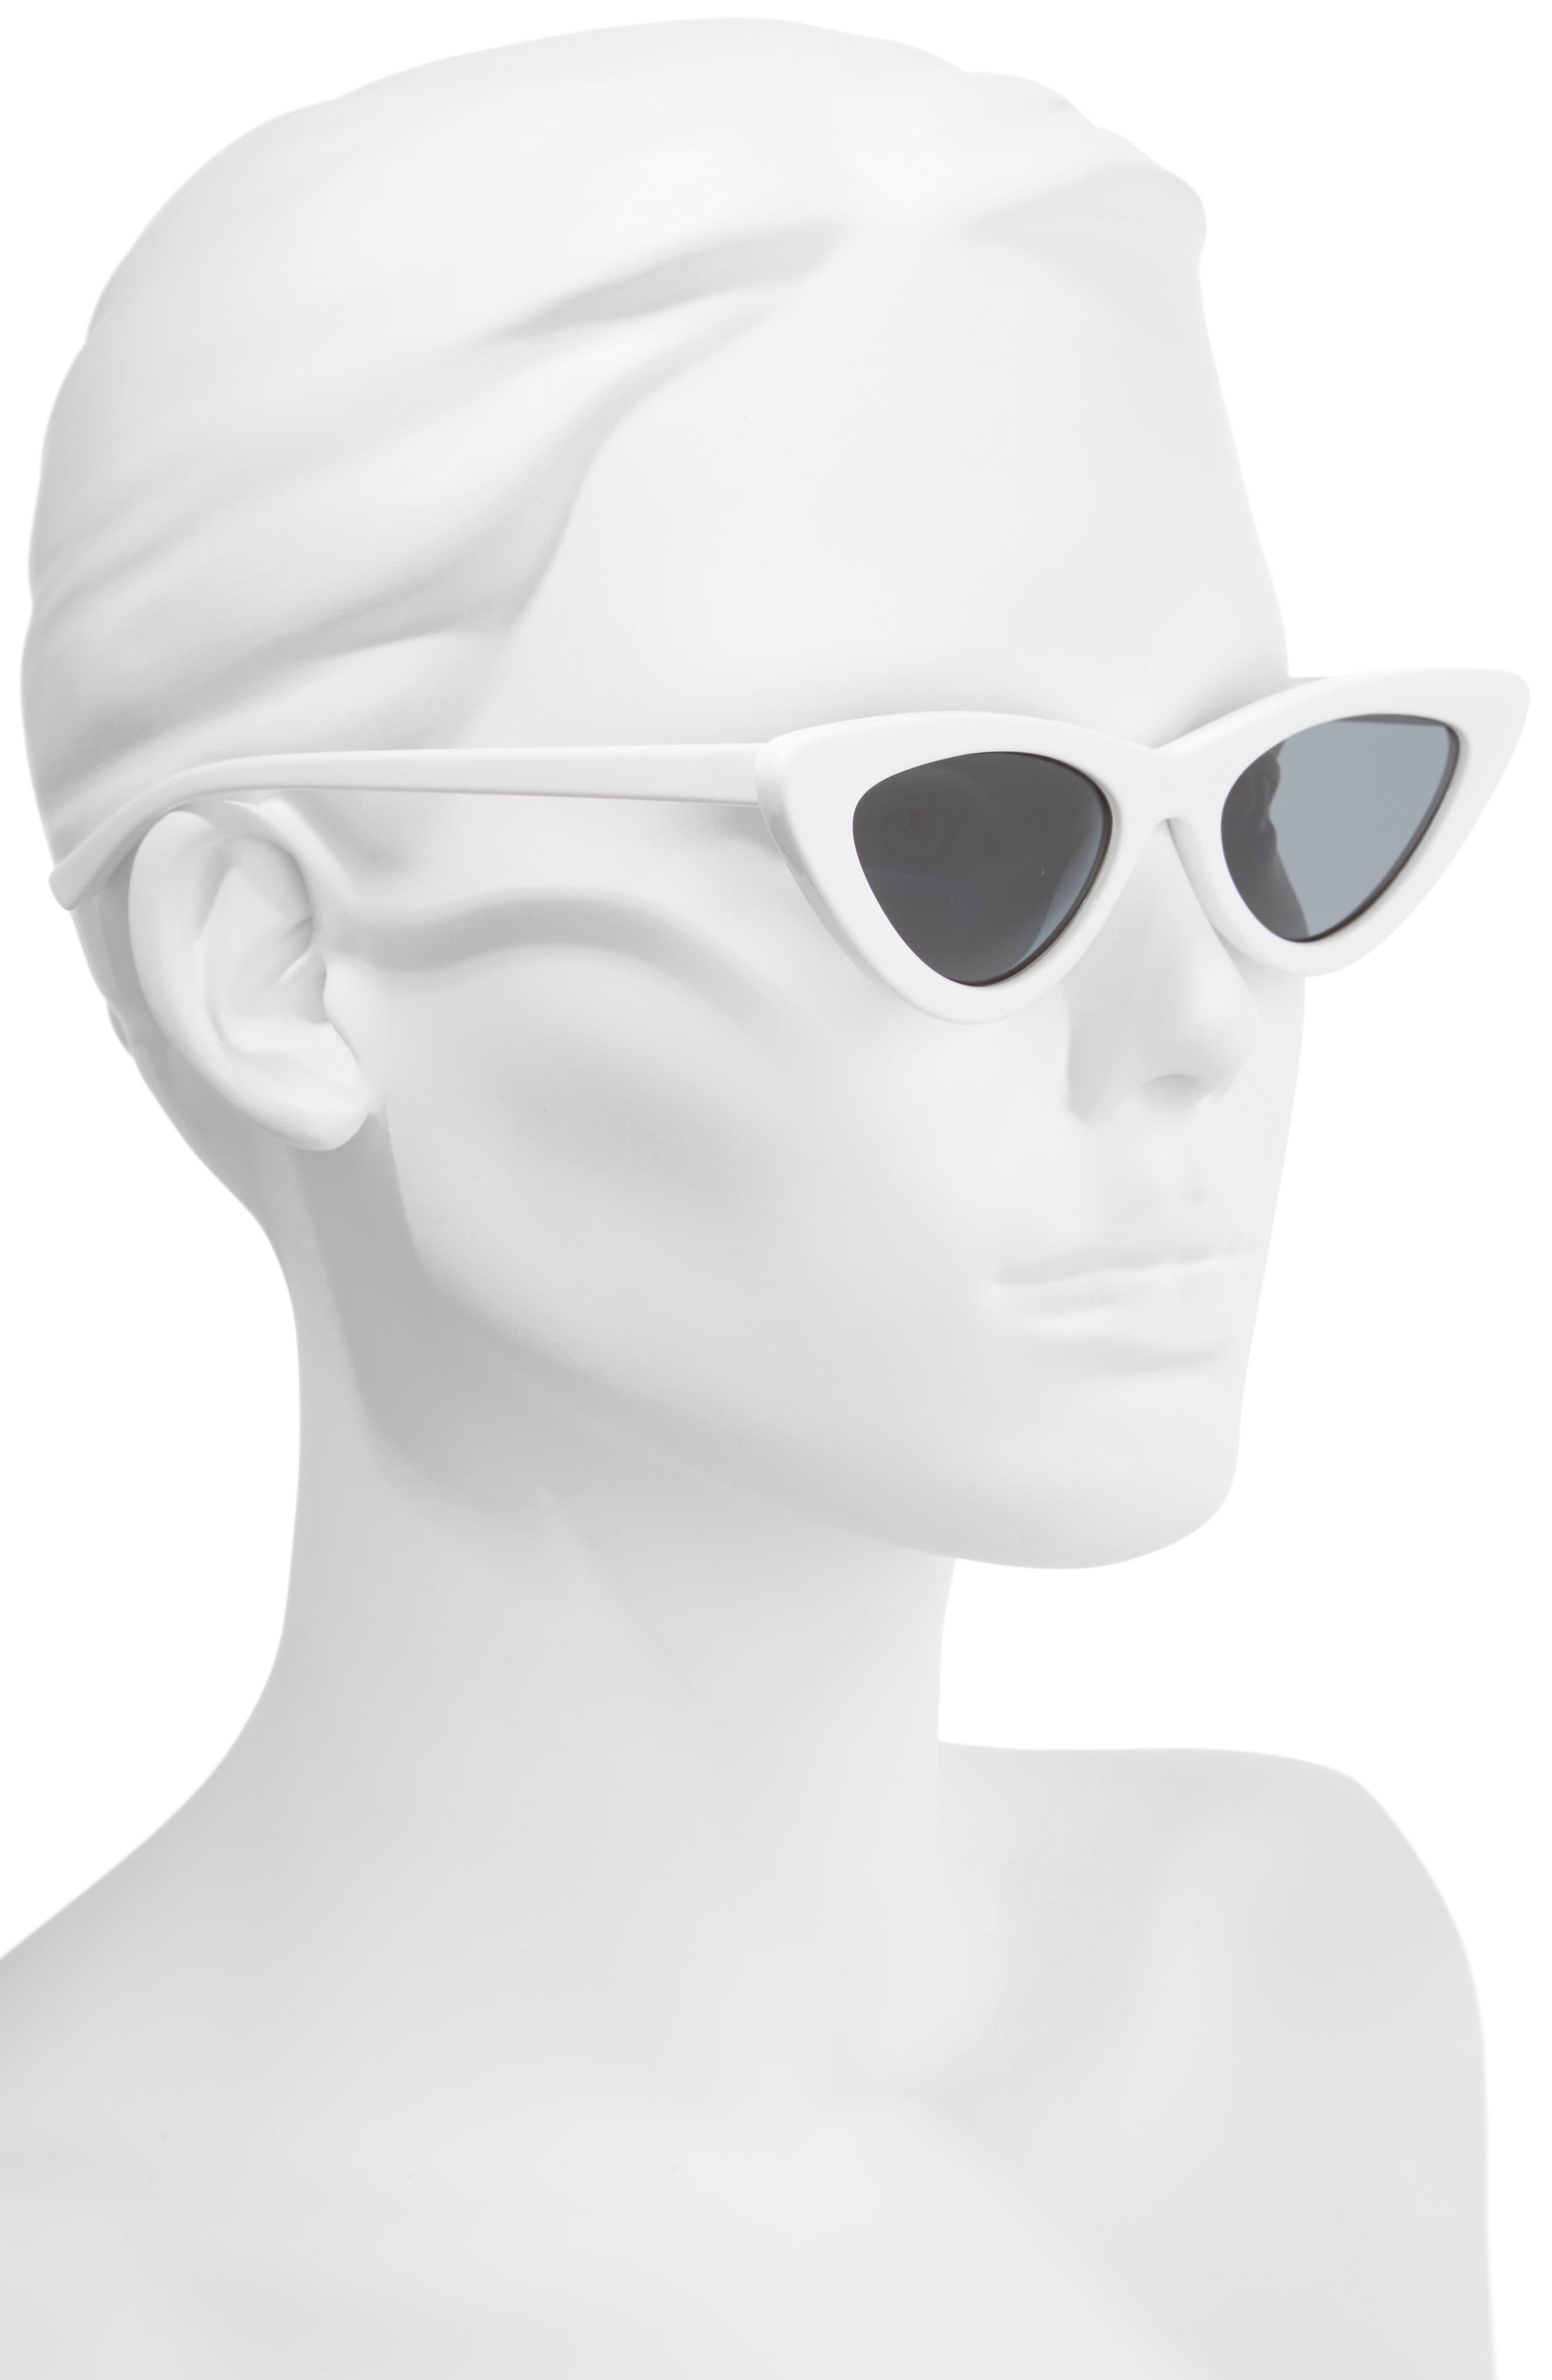 a8baa98873 Adam Selman X Le Specs Luxe Sunglasses for Women